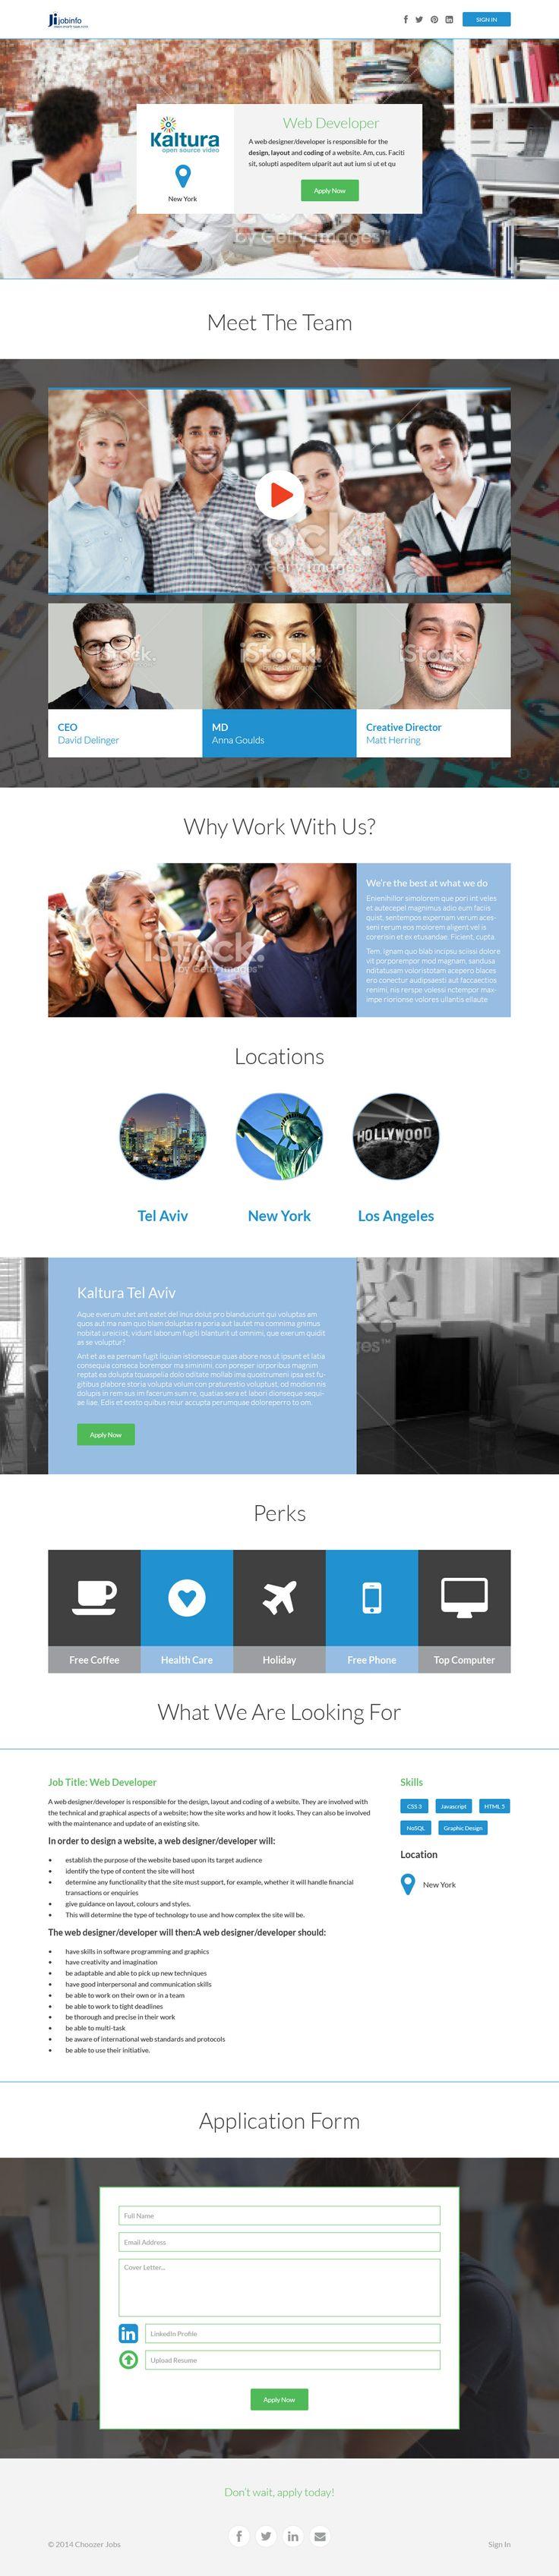 Choozer Jobs (mockup only) #Flat #WebDesign by #YellowDNA